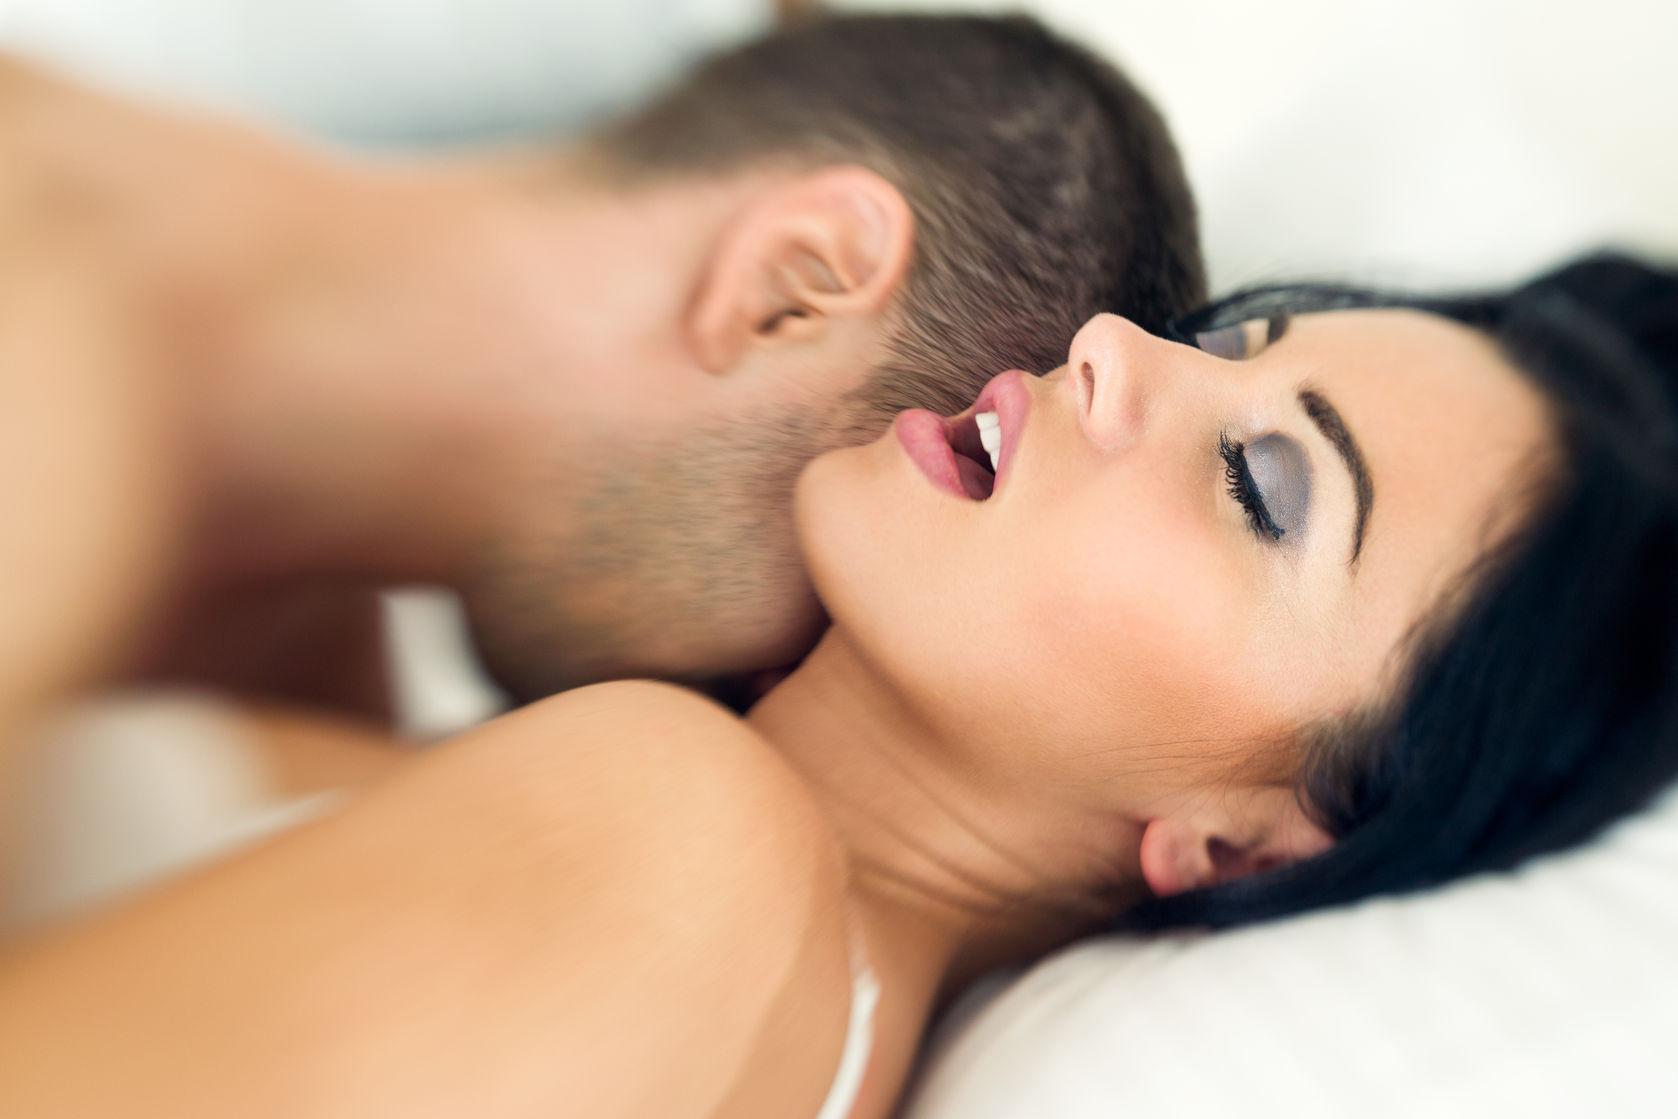 sexual-activity_sex addiction